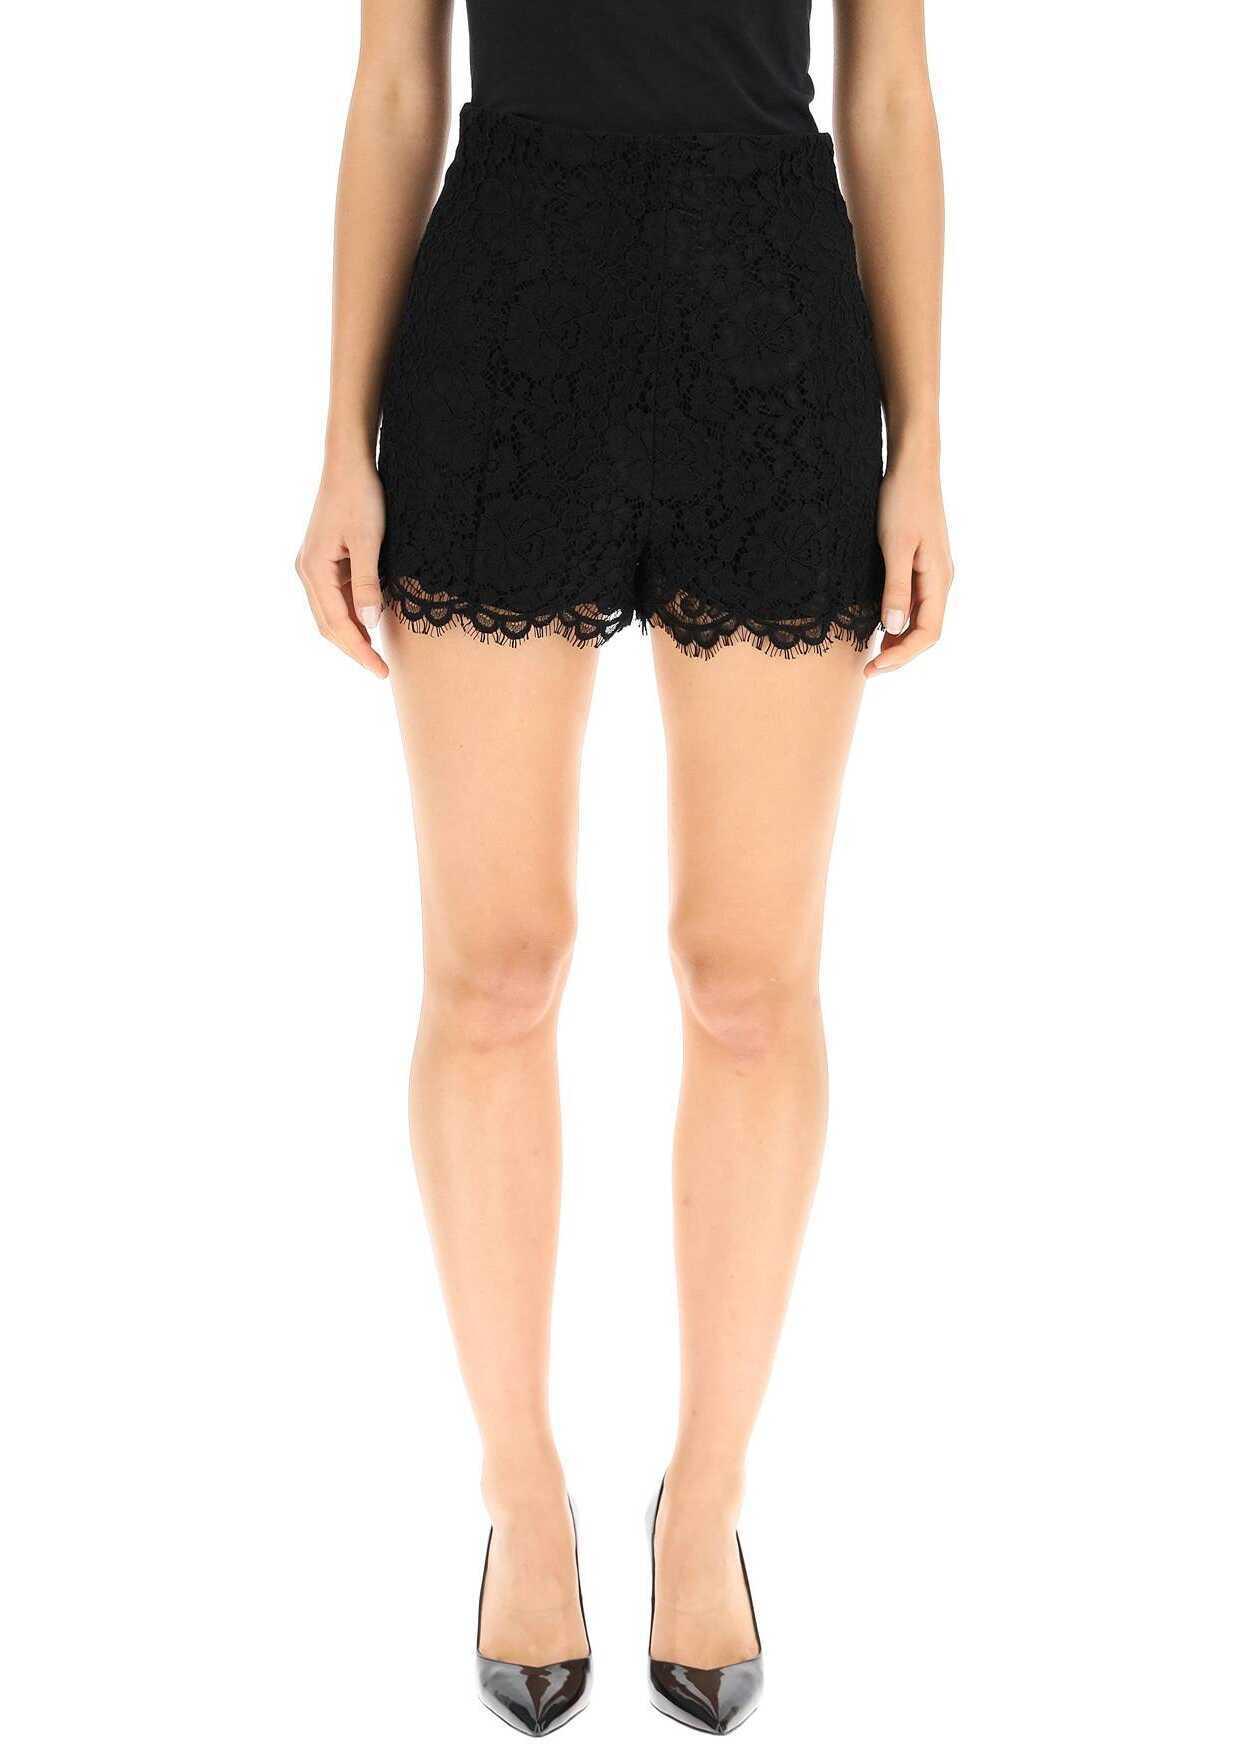 RED VALENTINO Lace Shorts WR0RF00T66B NERO image0